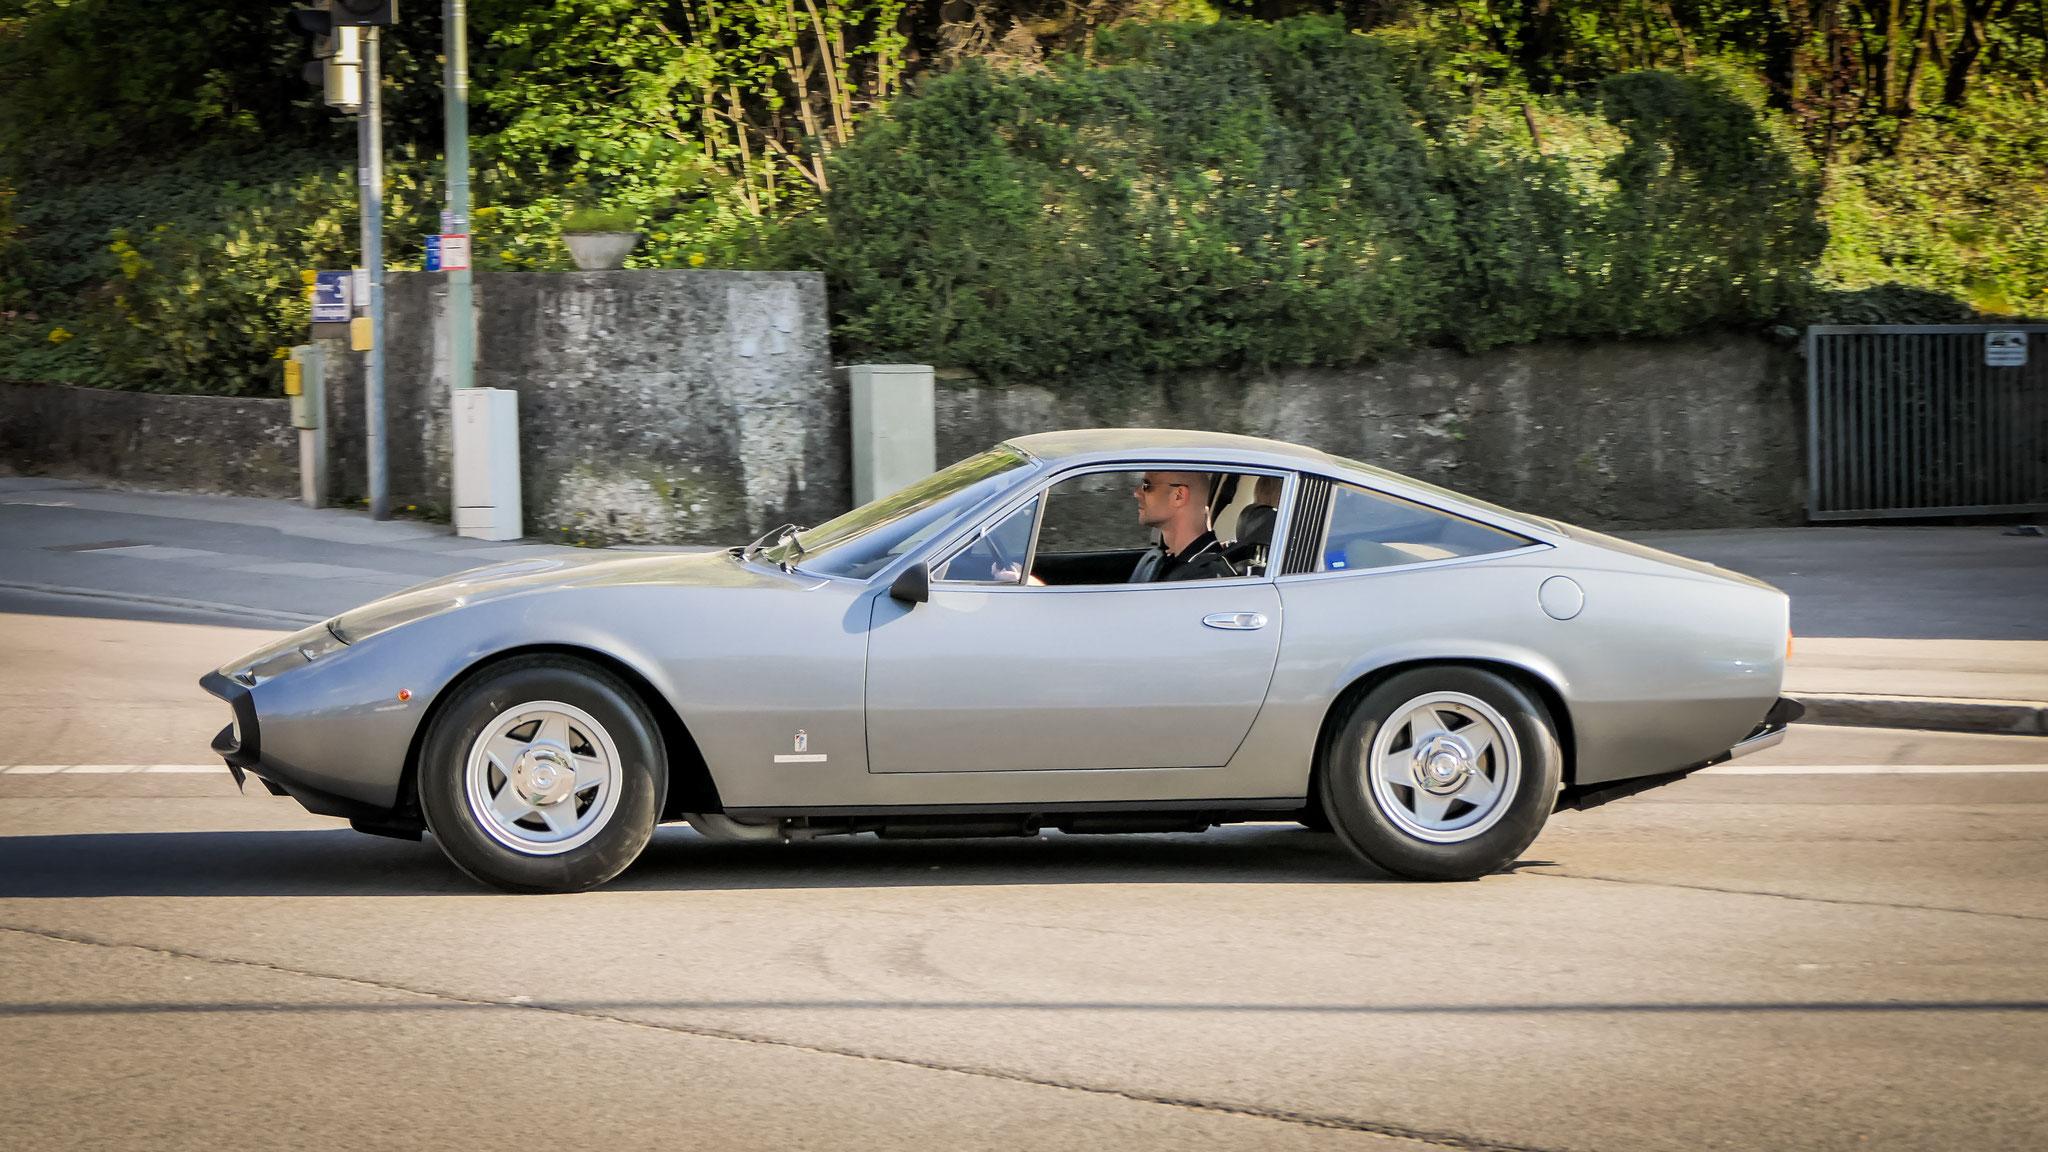 Ferrari 365 GTC4 - M-QO-356H